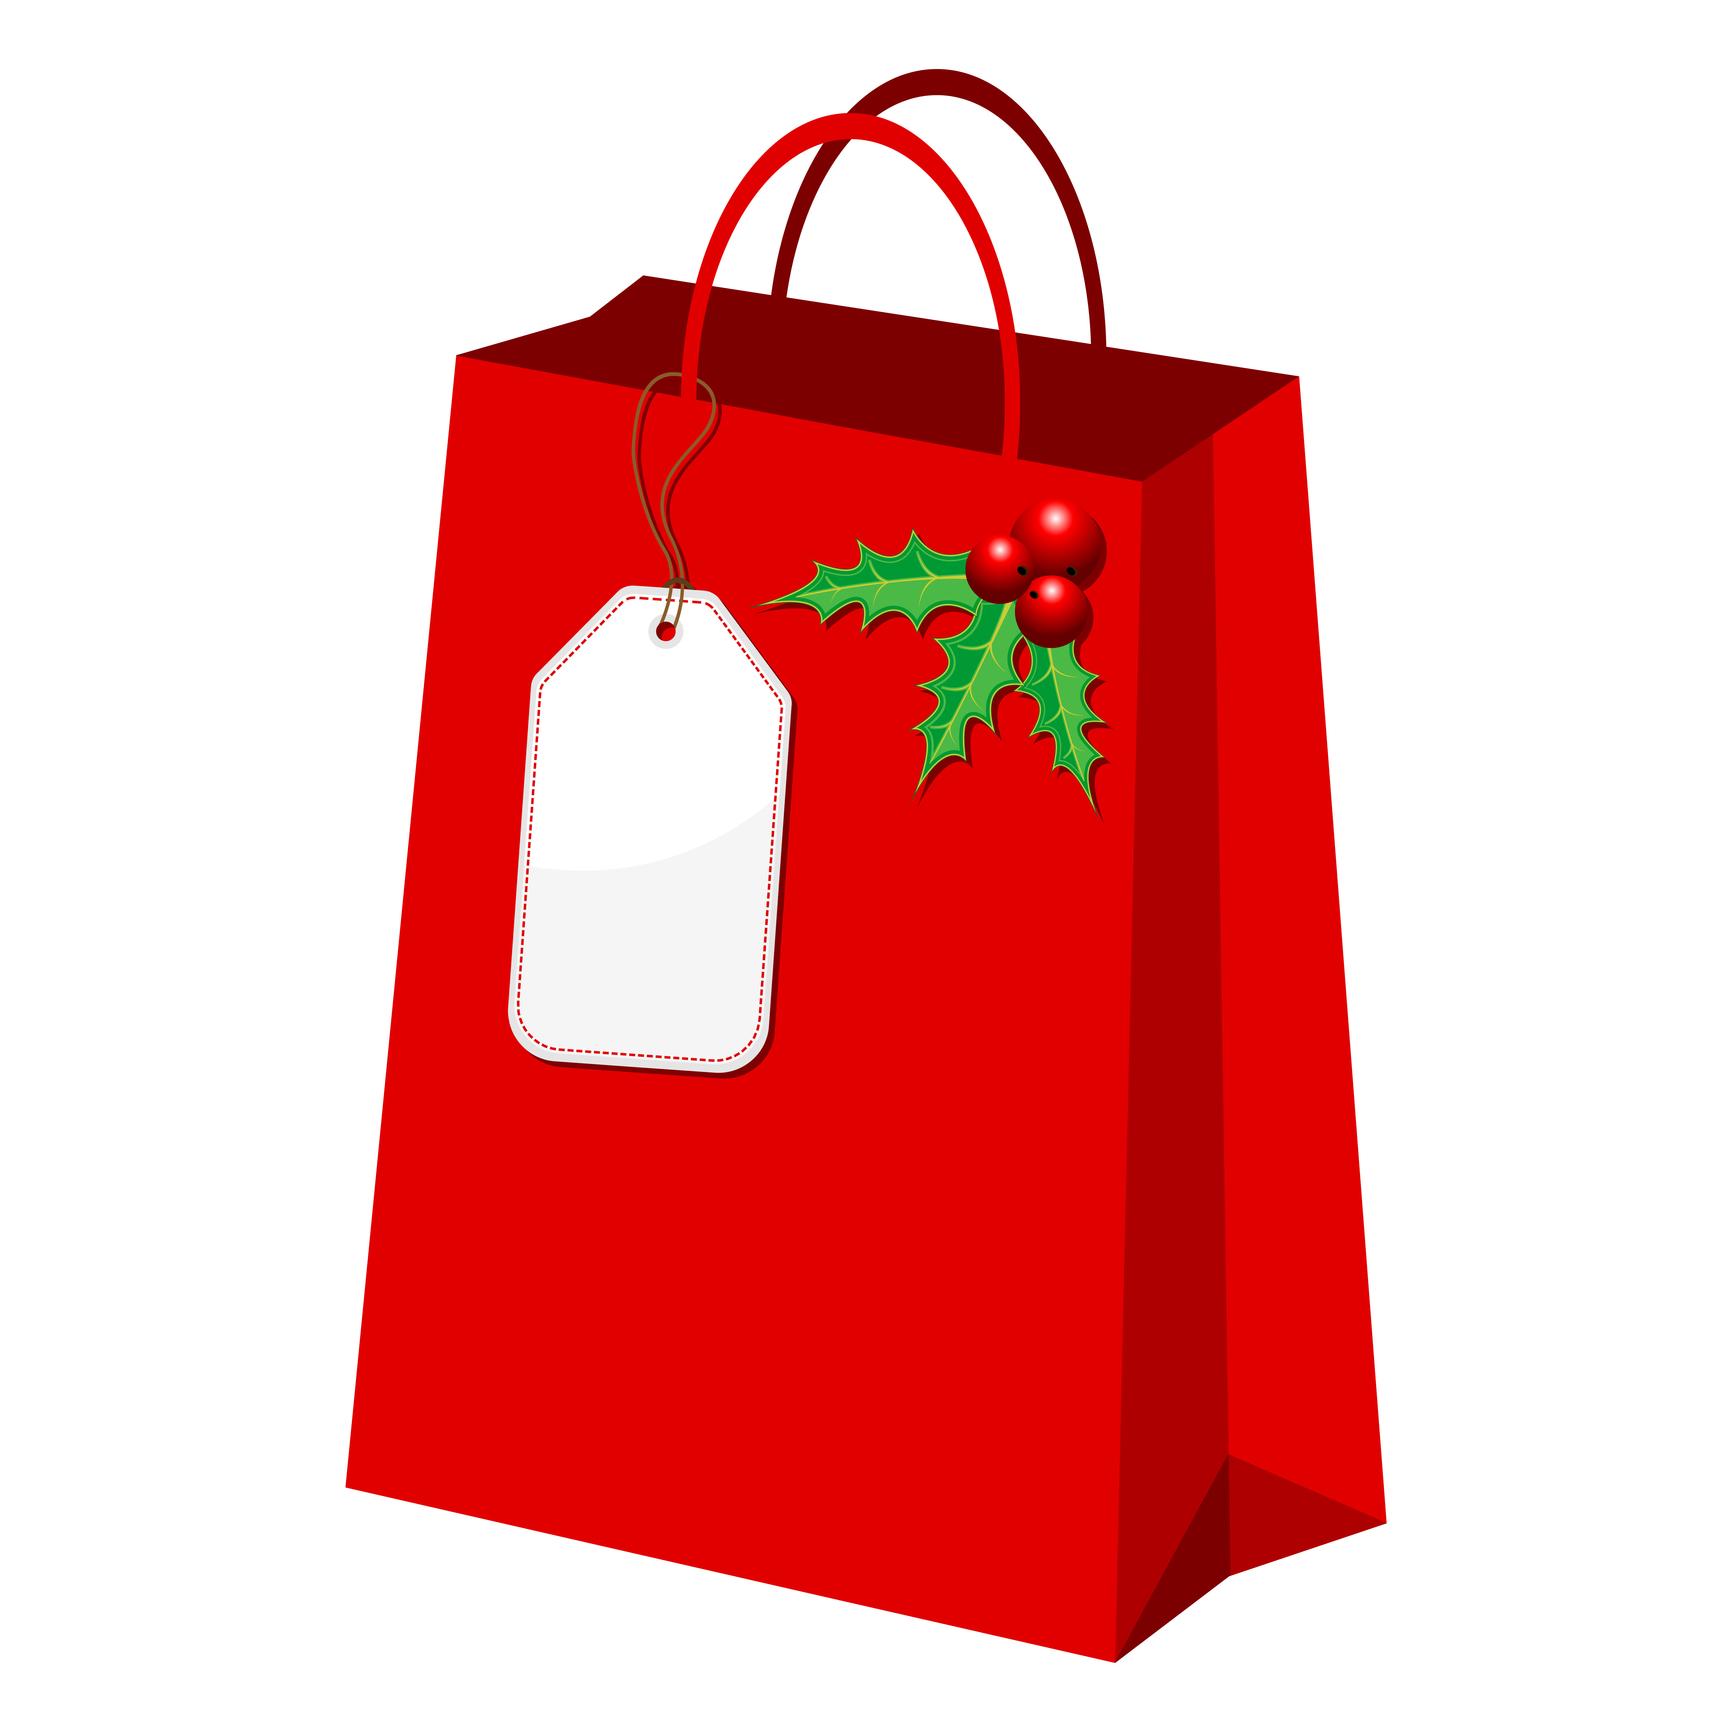 Station . Bag clipart gift